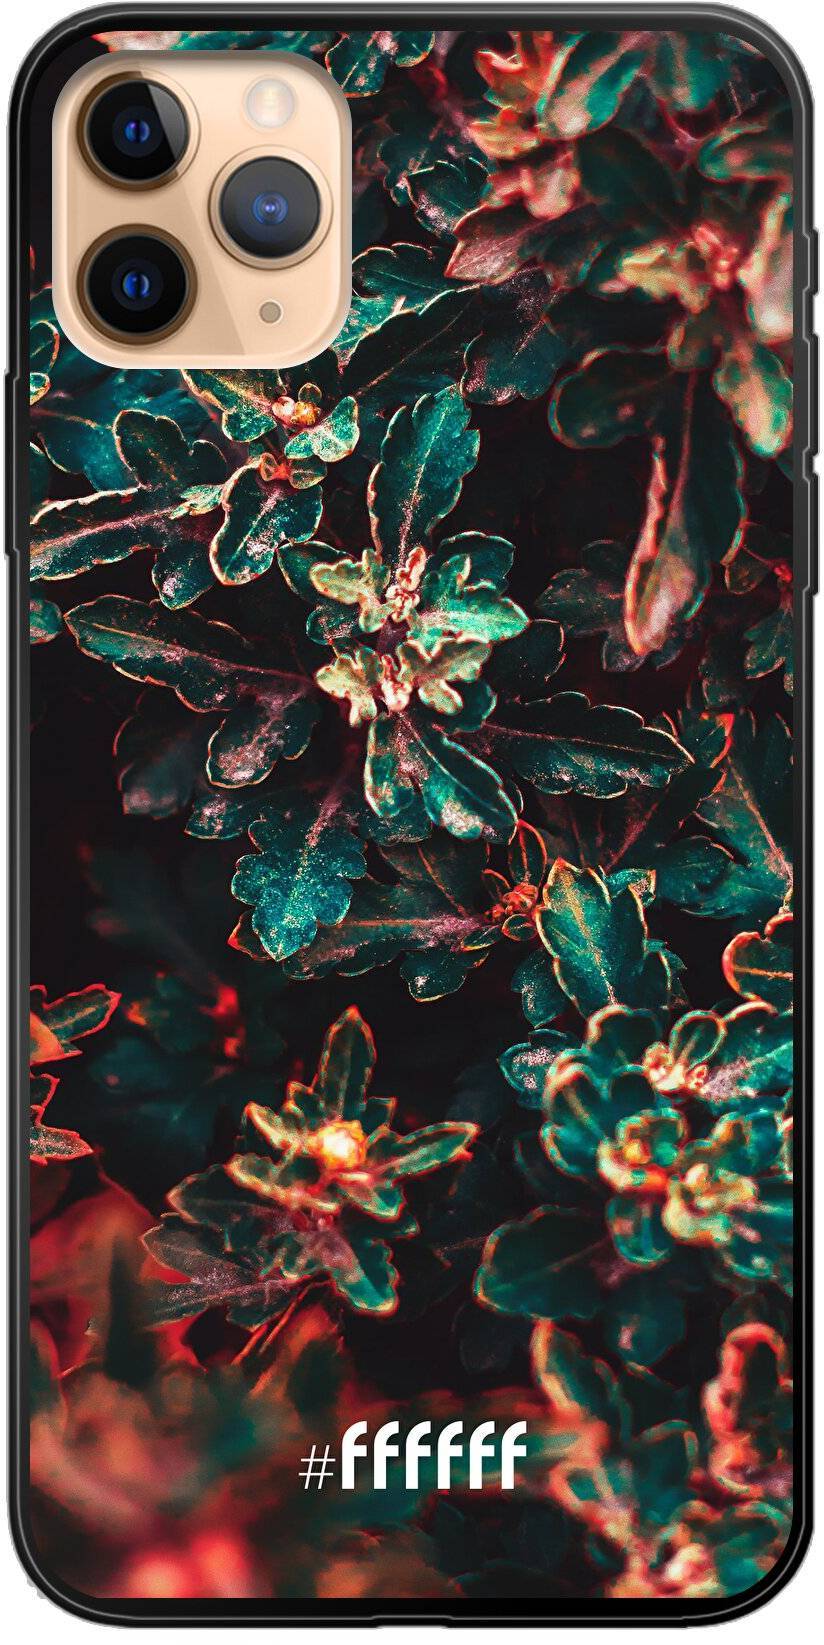 Ornament iPhone 11 Pro Max